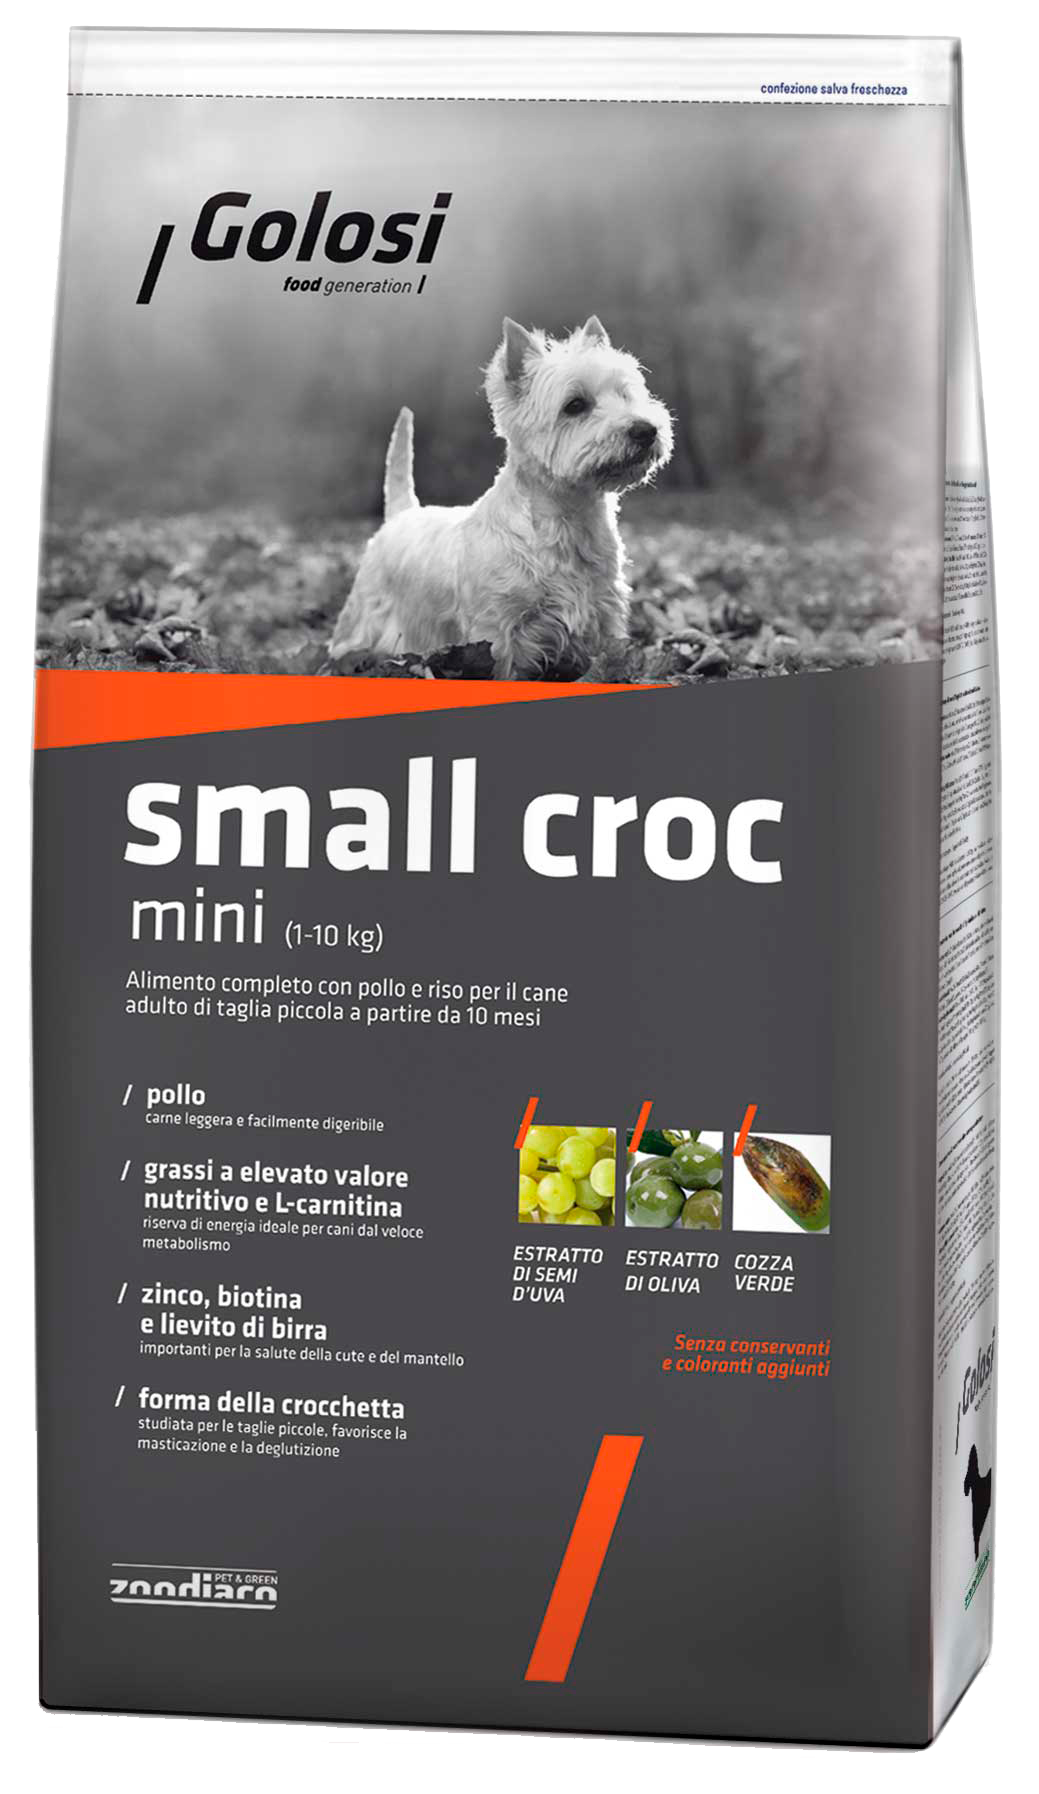 Golosi Small Croc Mini корм для собак со вкусом курицы и риса, 12кг